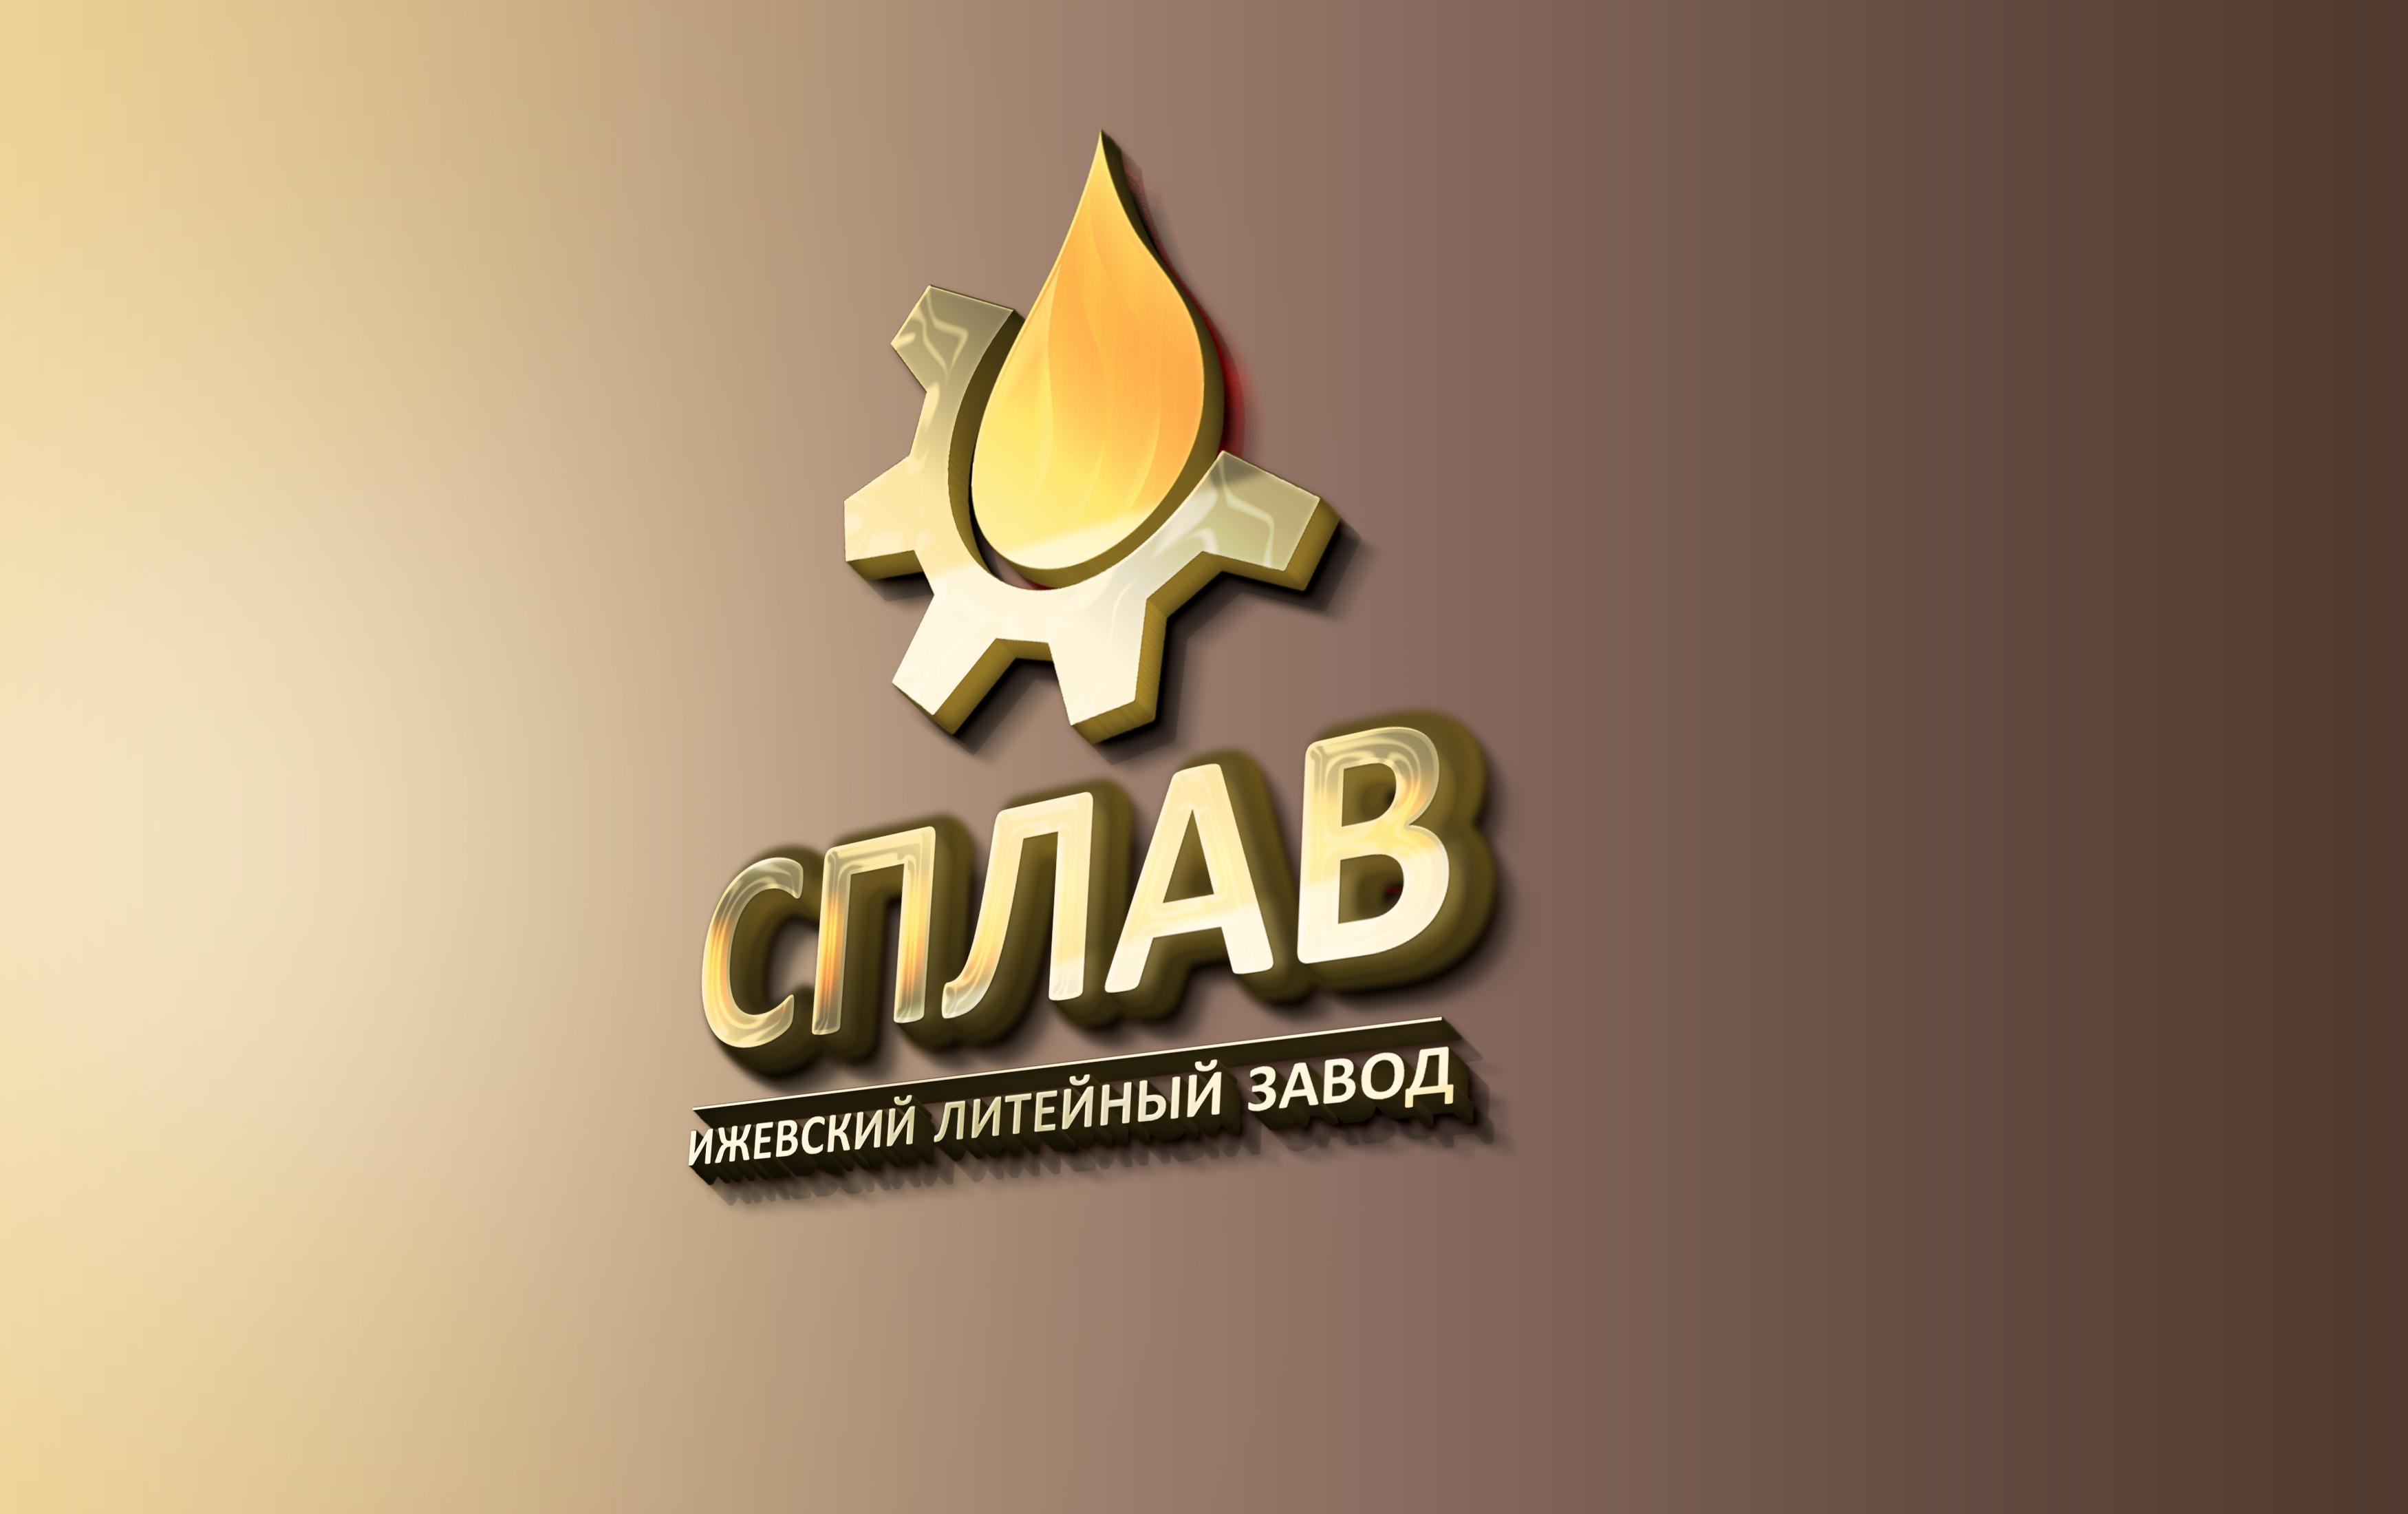 Разработать логотип для литейного завода фото f_1575b152f6ea295d.jpg